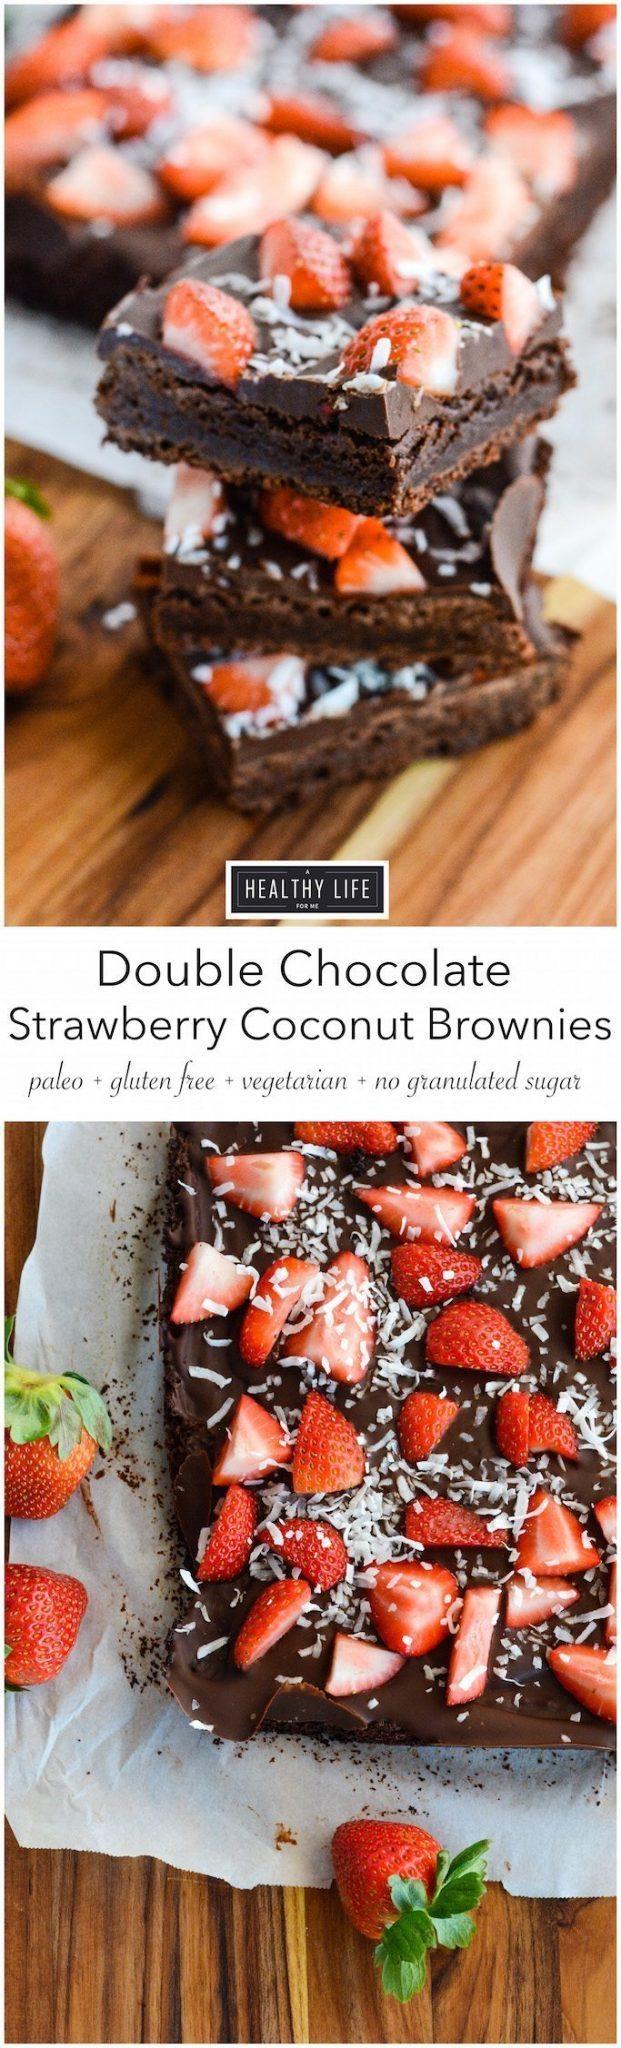 Paleo Double Chocolate Strawberry Coconut Brownie Recipe | ahealthylifeforme.com